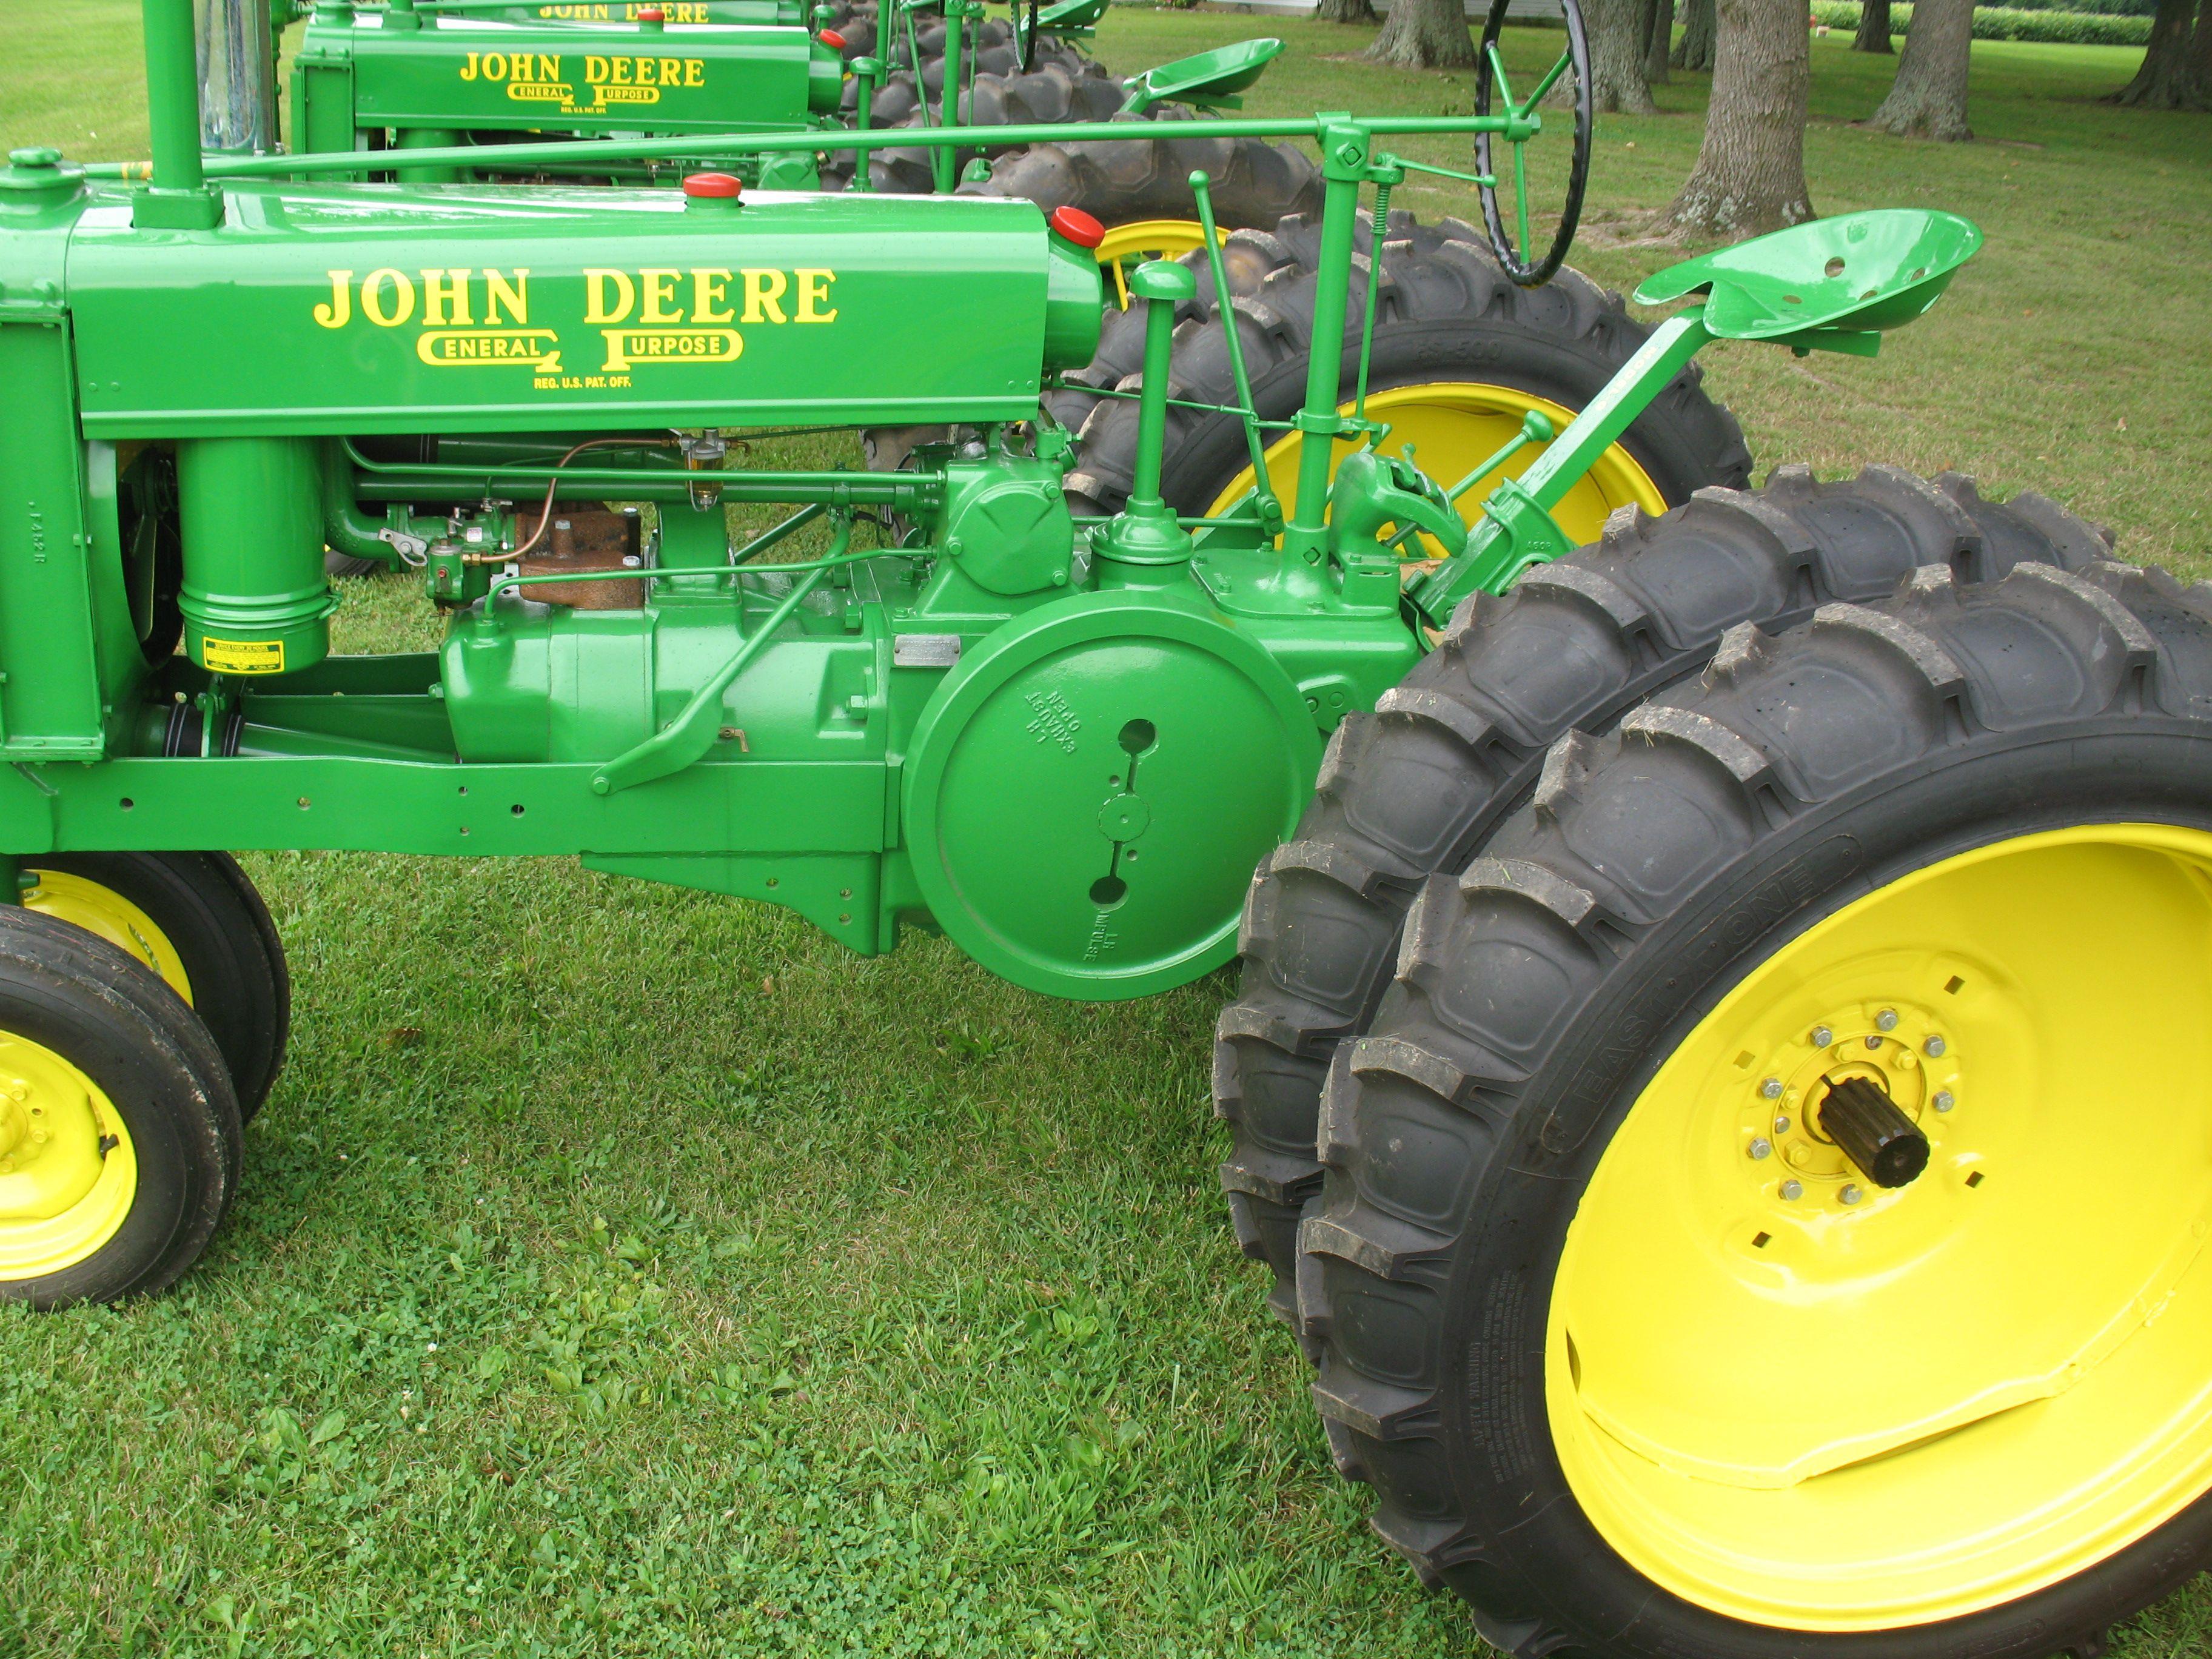 John deere g with duals john deere tractors pinterest for G architecture massy